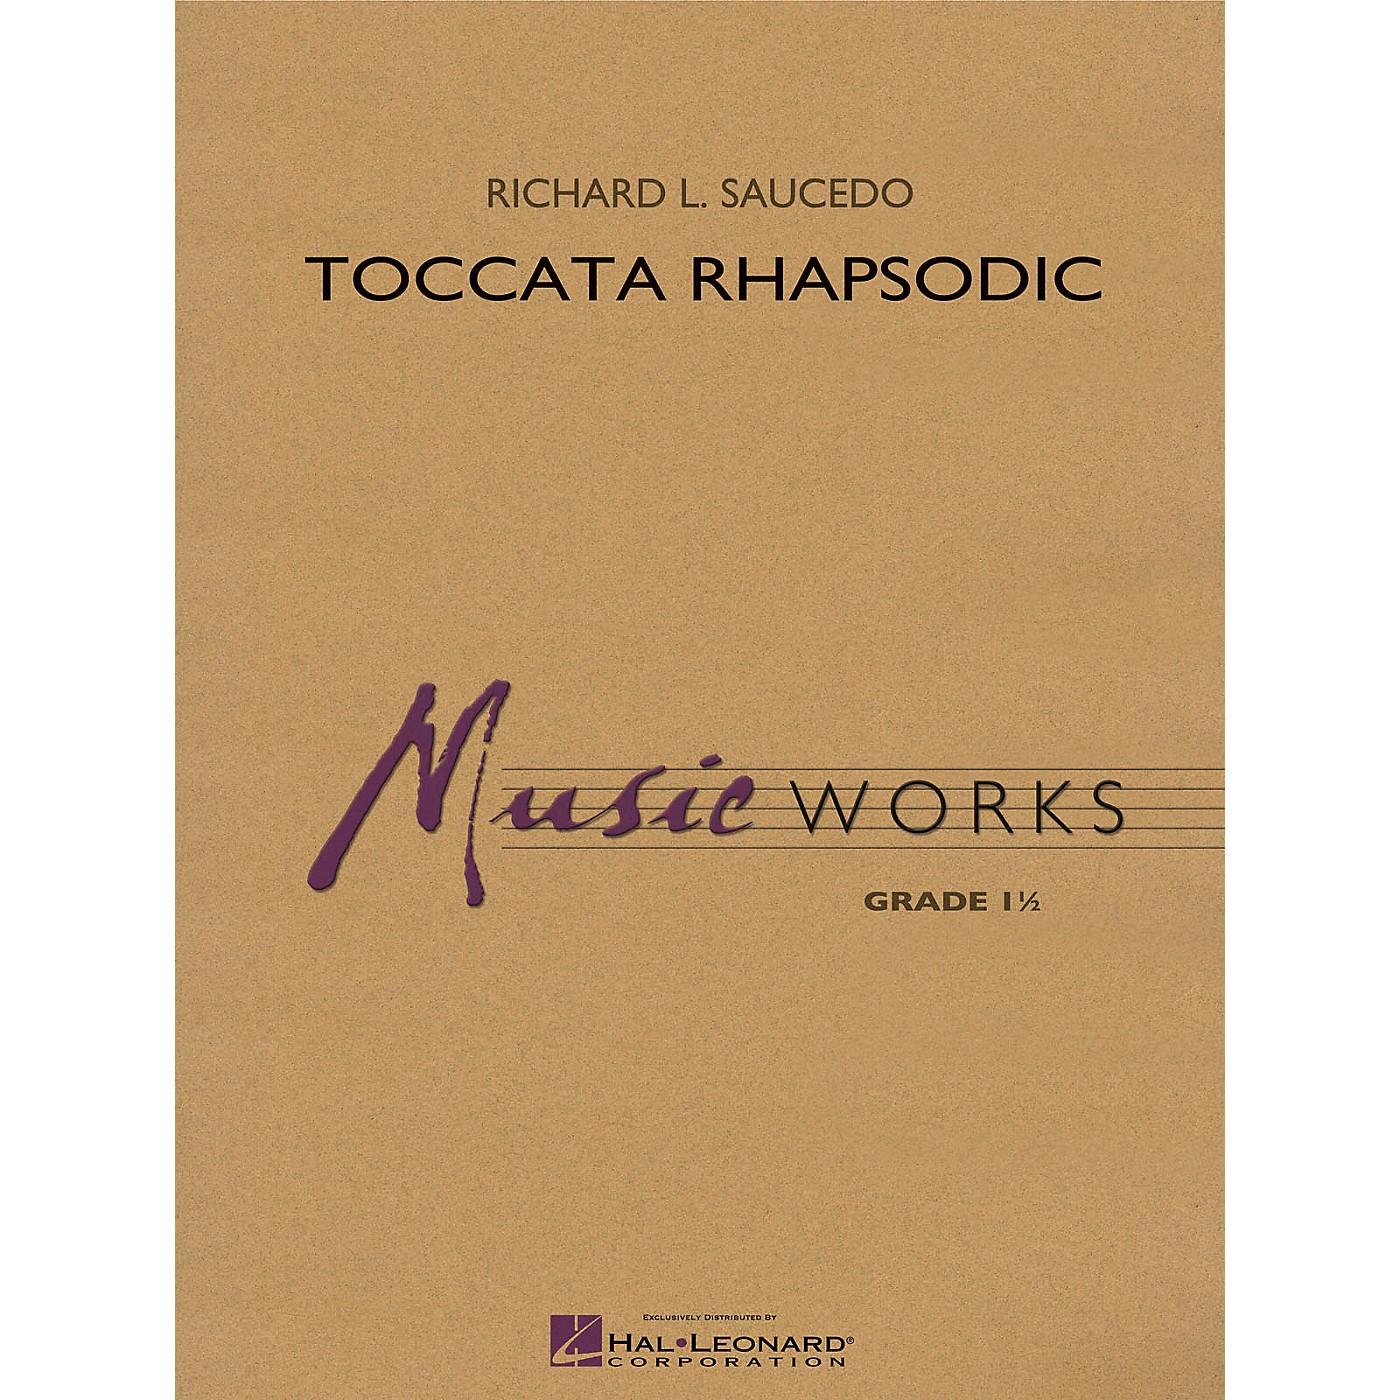 Hal Leonard Toccata Rhapsodic Concert Band Level 1.5 Composed by Richard L. Saucedo thumbnail